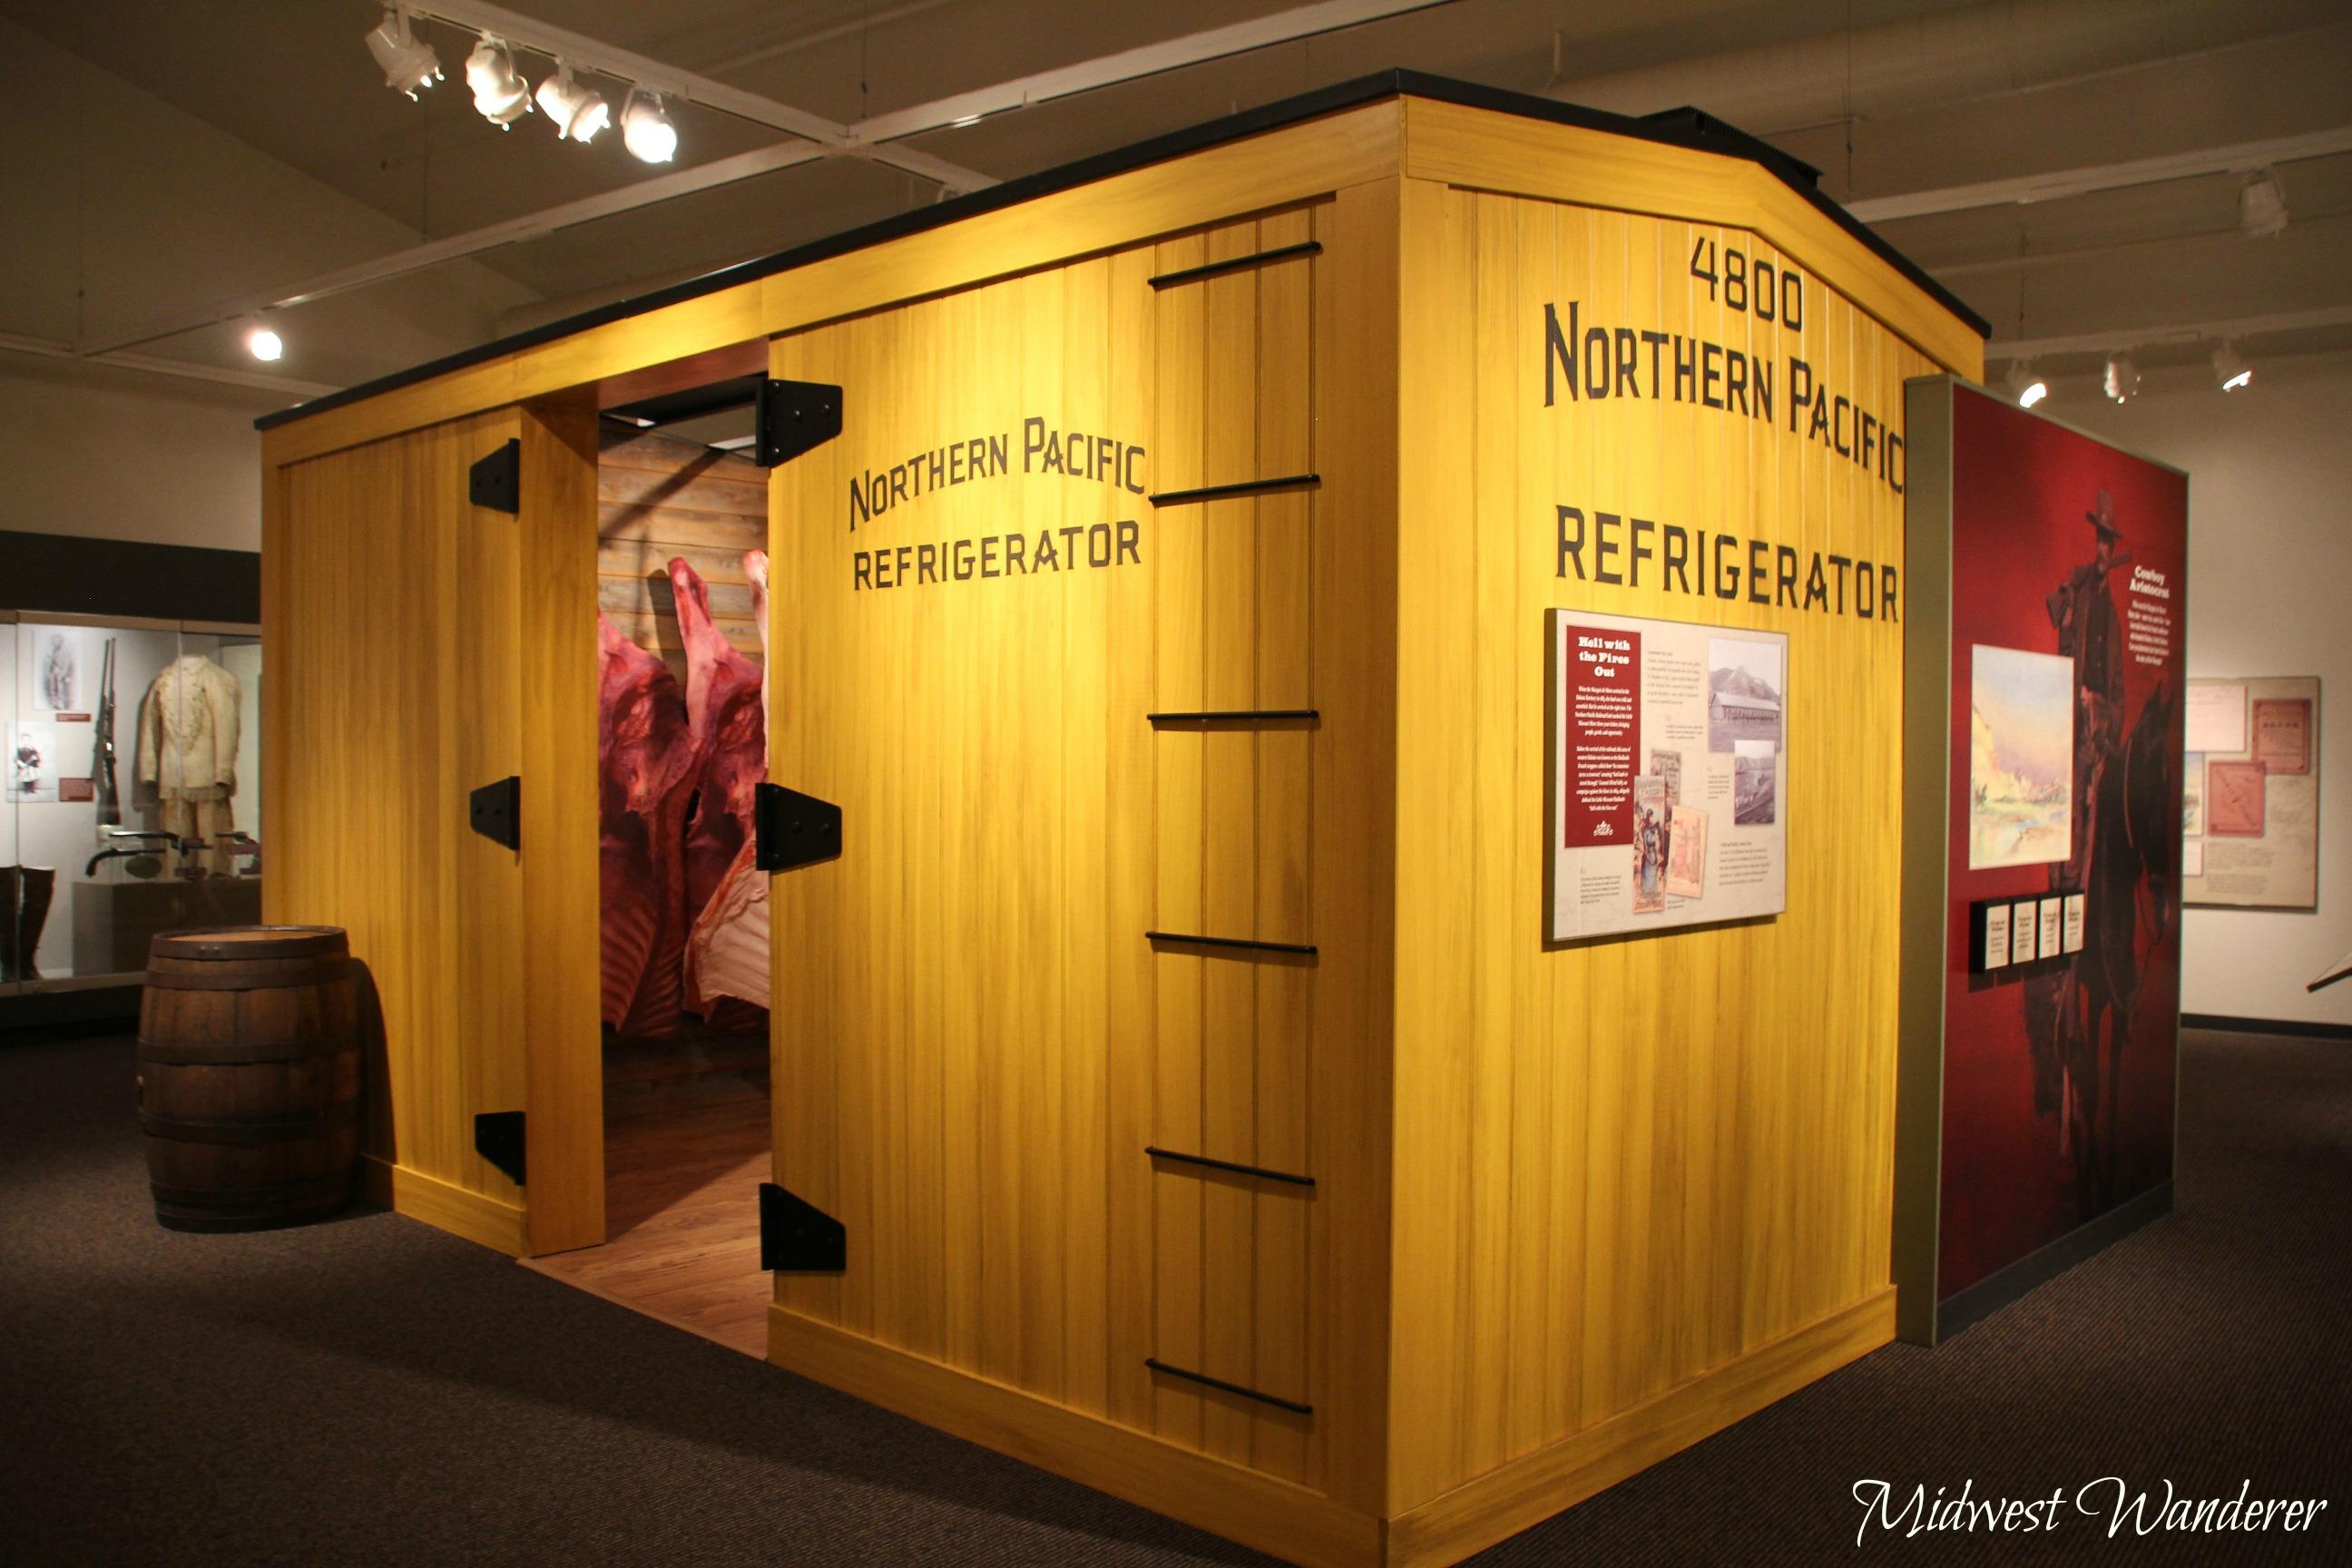 Refrigerated box car